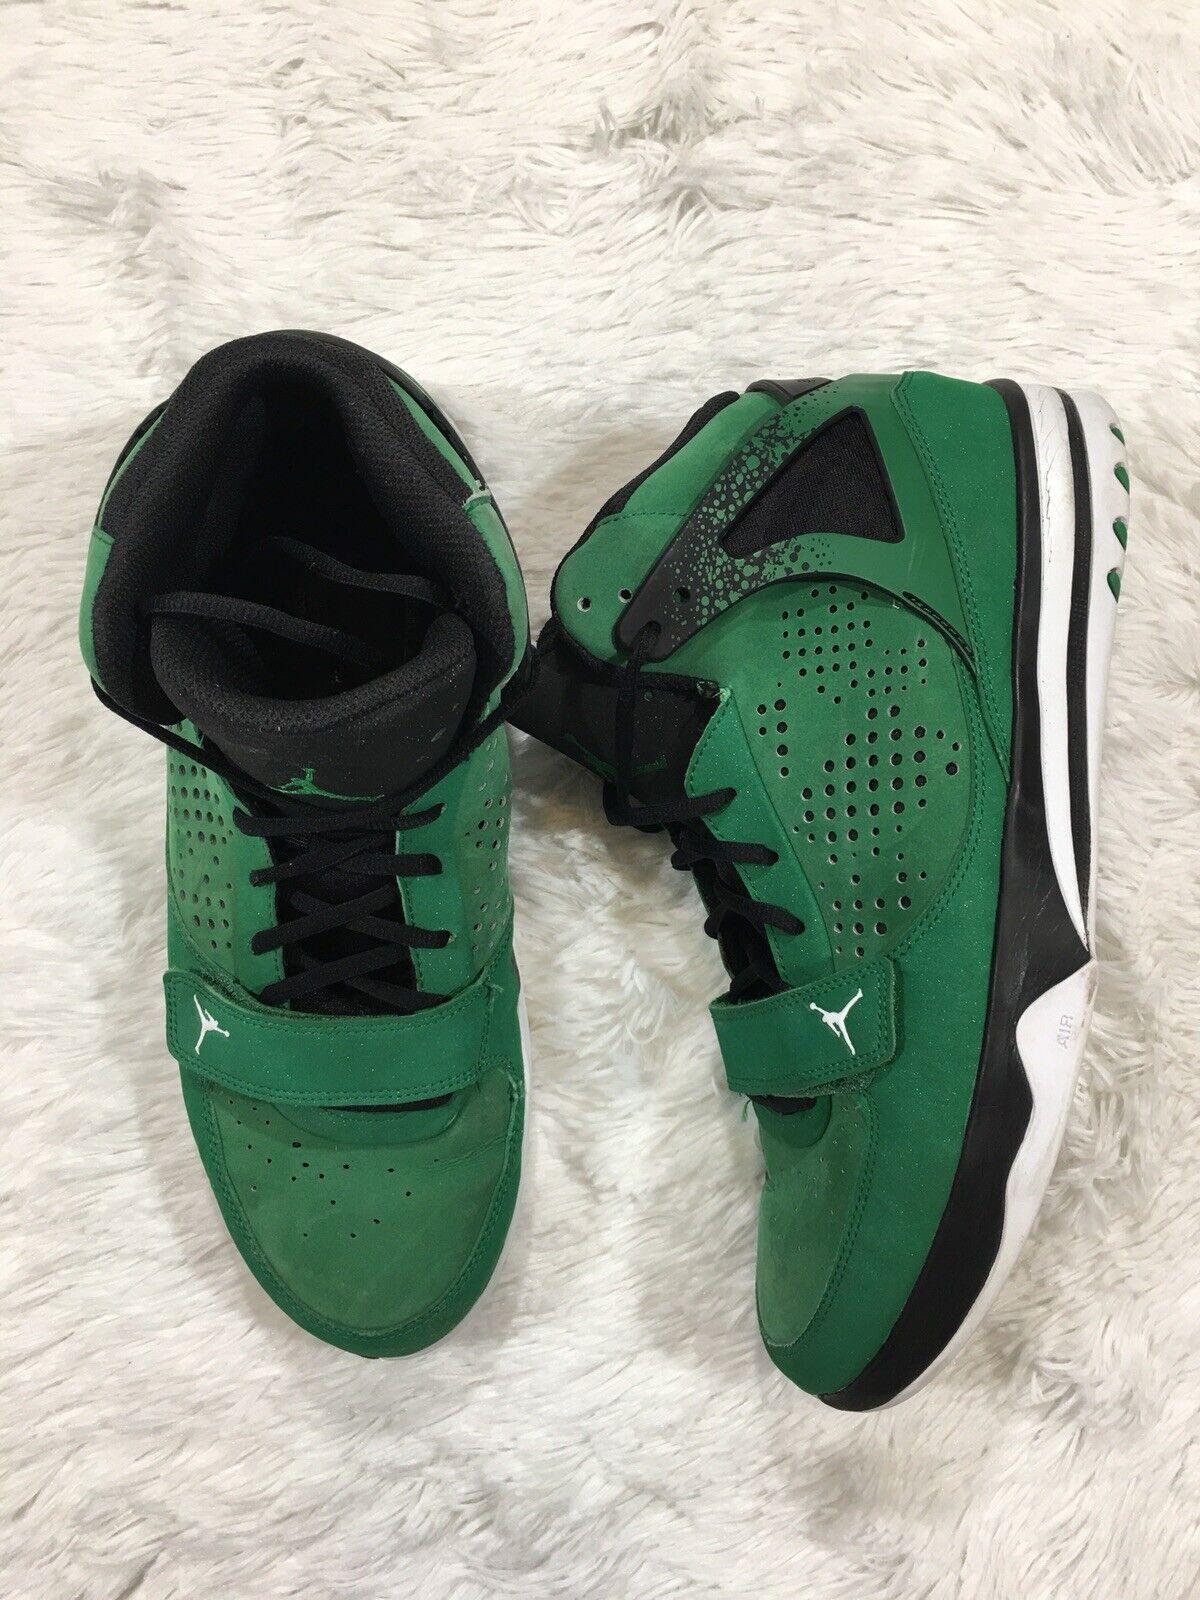 Nike Air Men's Size 13 Jordan Flight Phase 23 Hoops Sneakers Basketball shoes